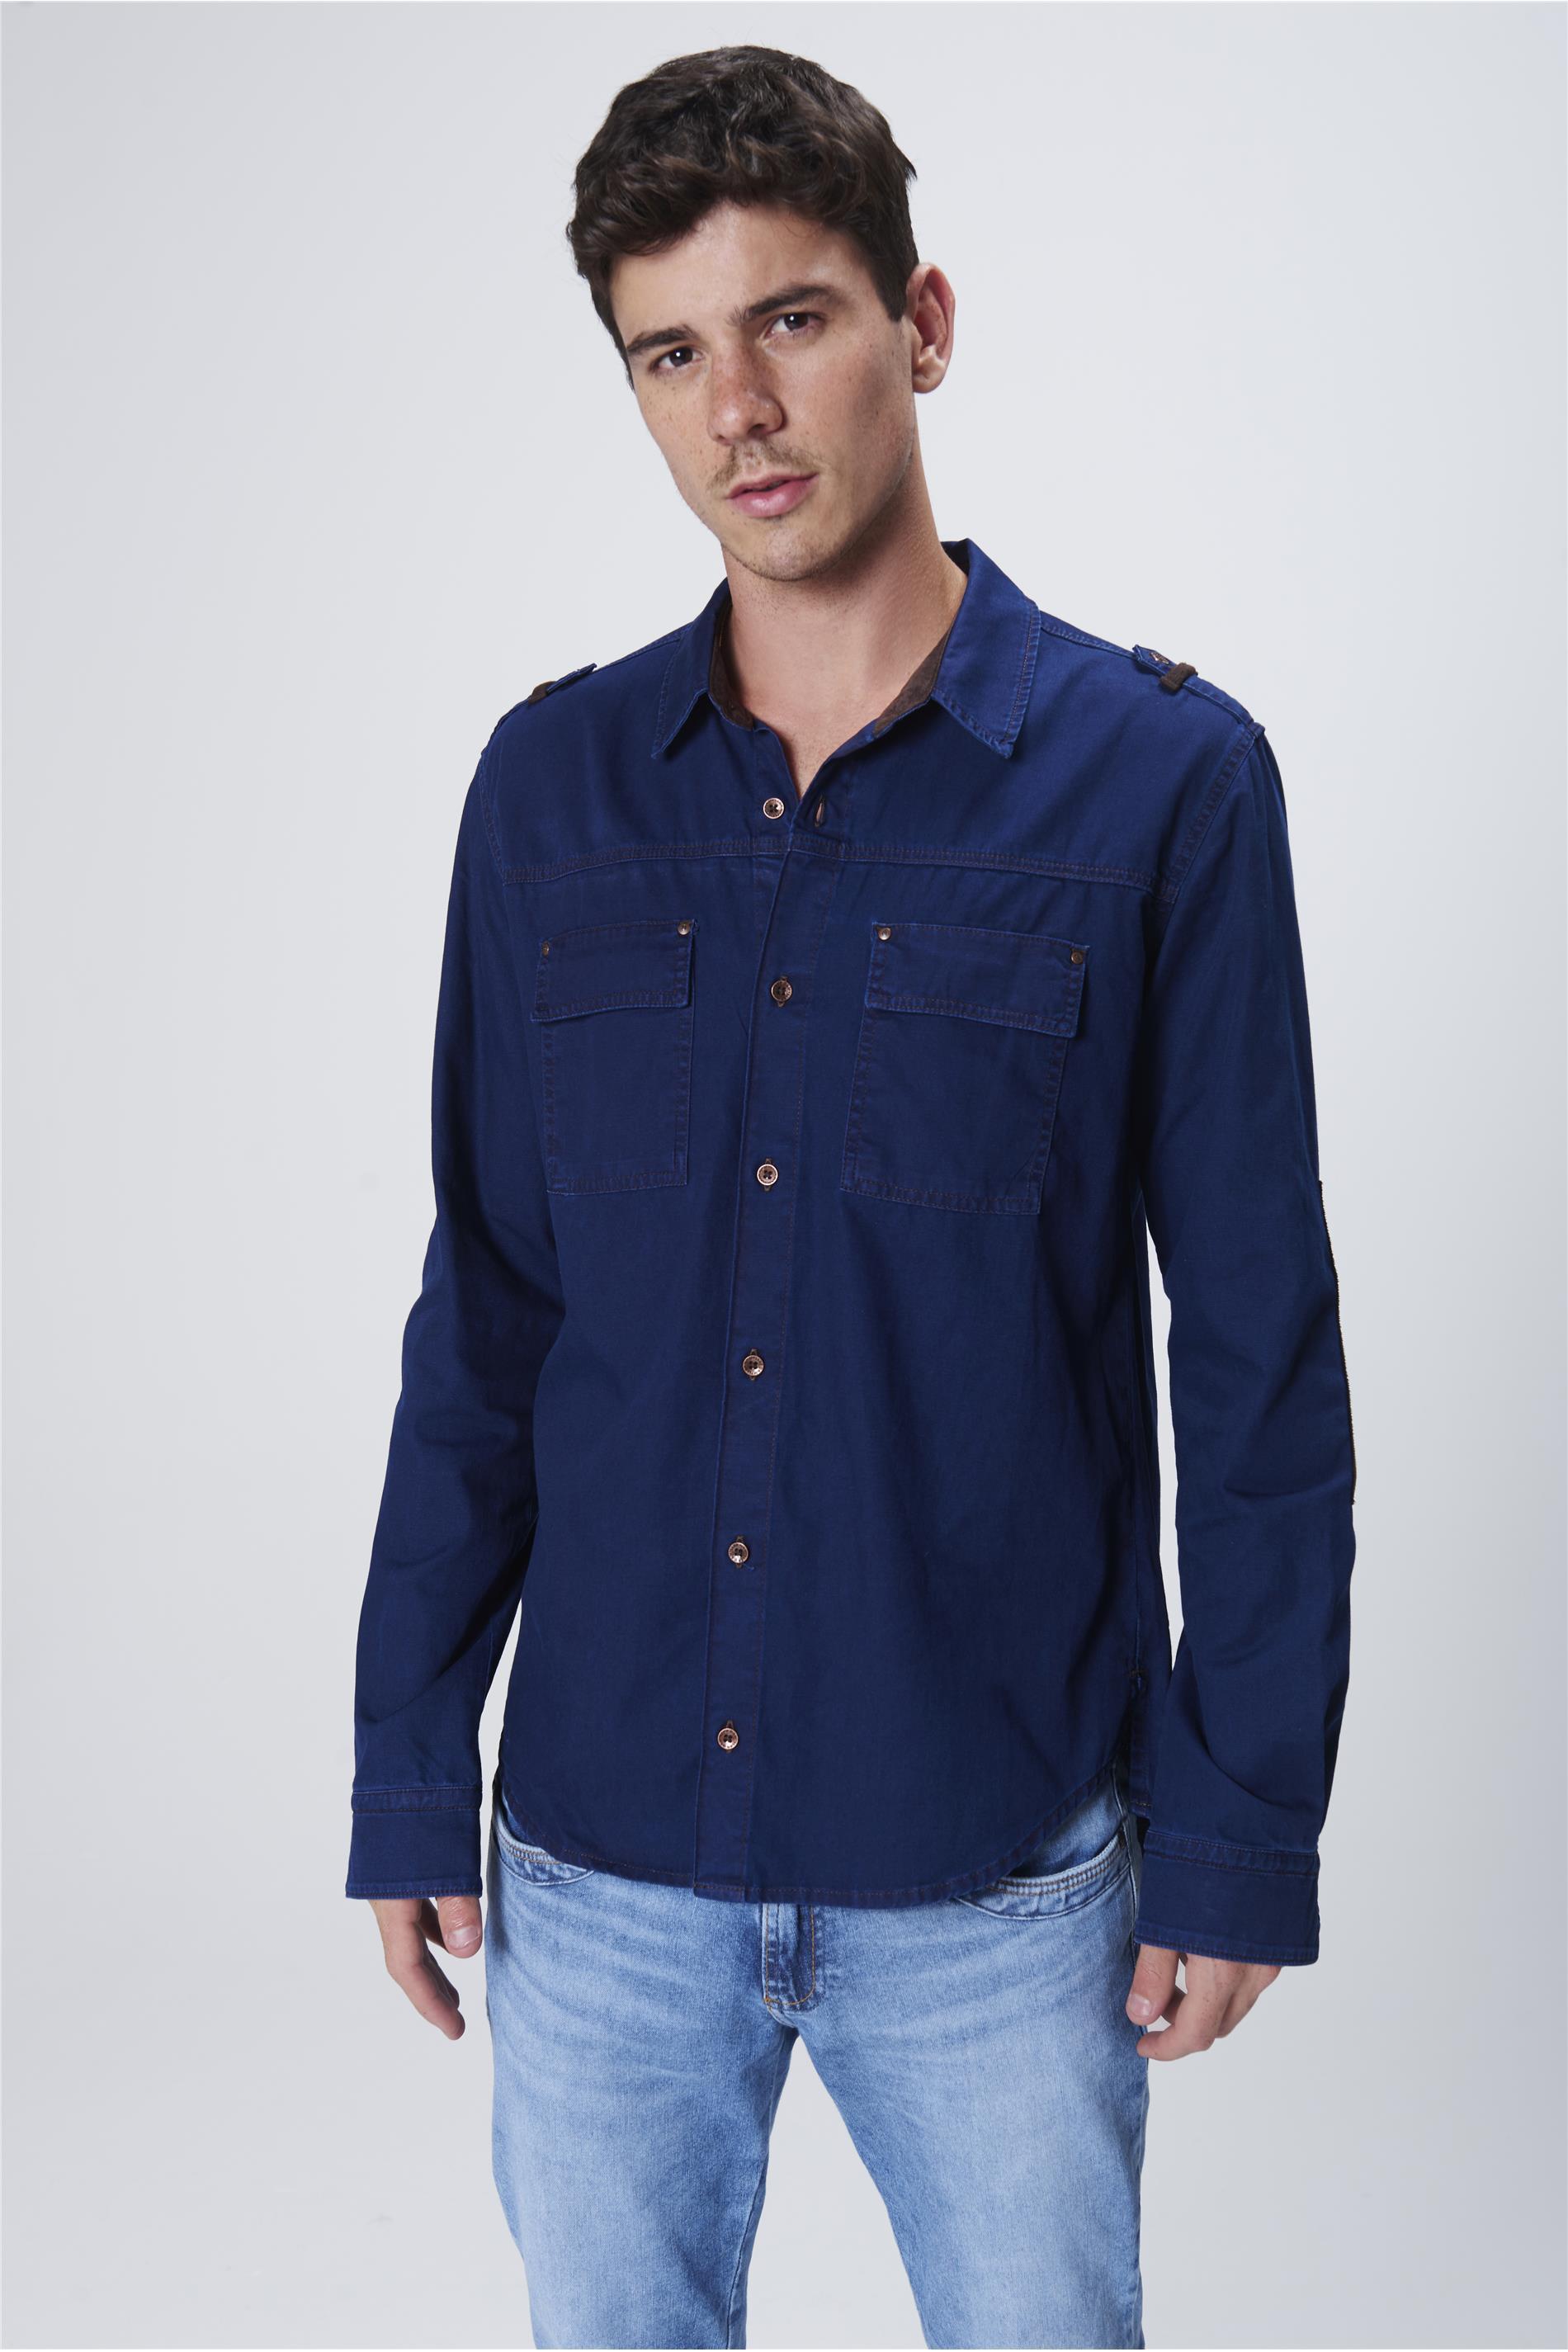 54518aa305 abrir. Camisa-Jeans-Masculina-Frente- ...